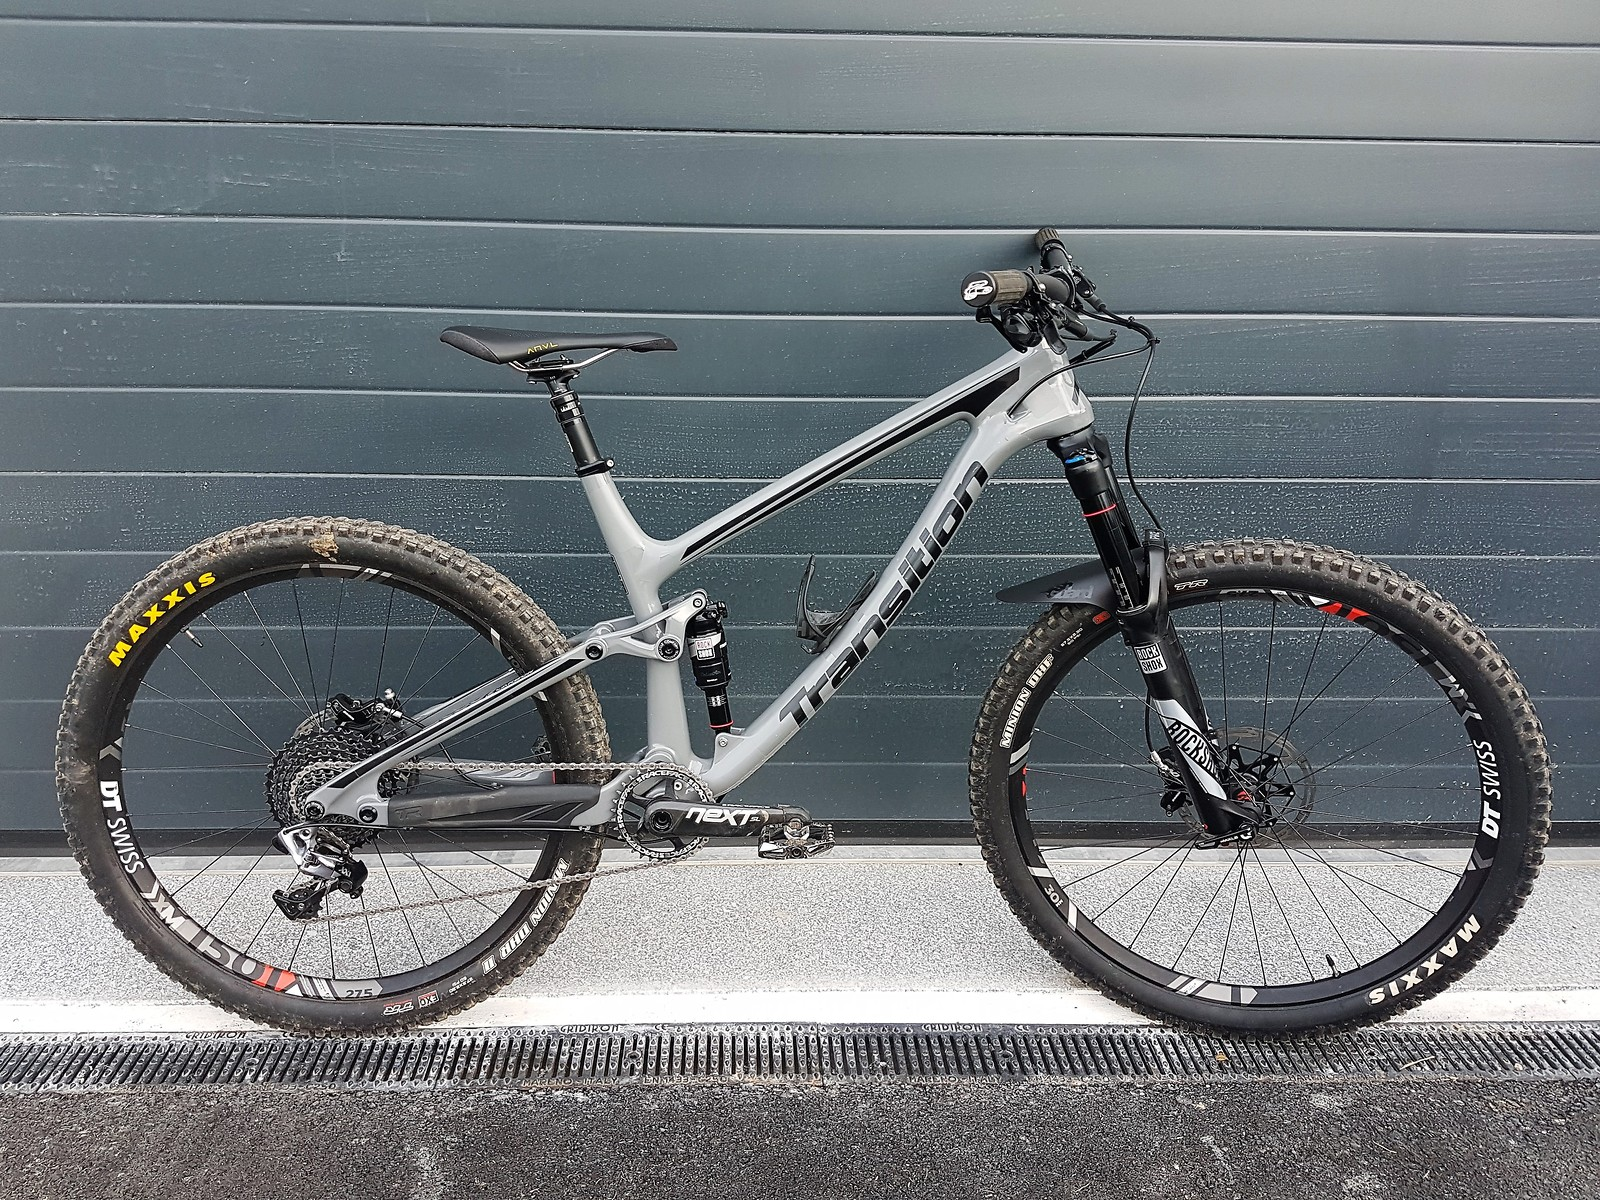 bf630049603 2017 Transition Scout Carbon - SOLD - mRwhite's Bike Check - Vital MTB